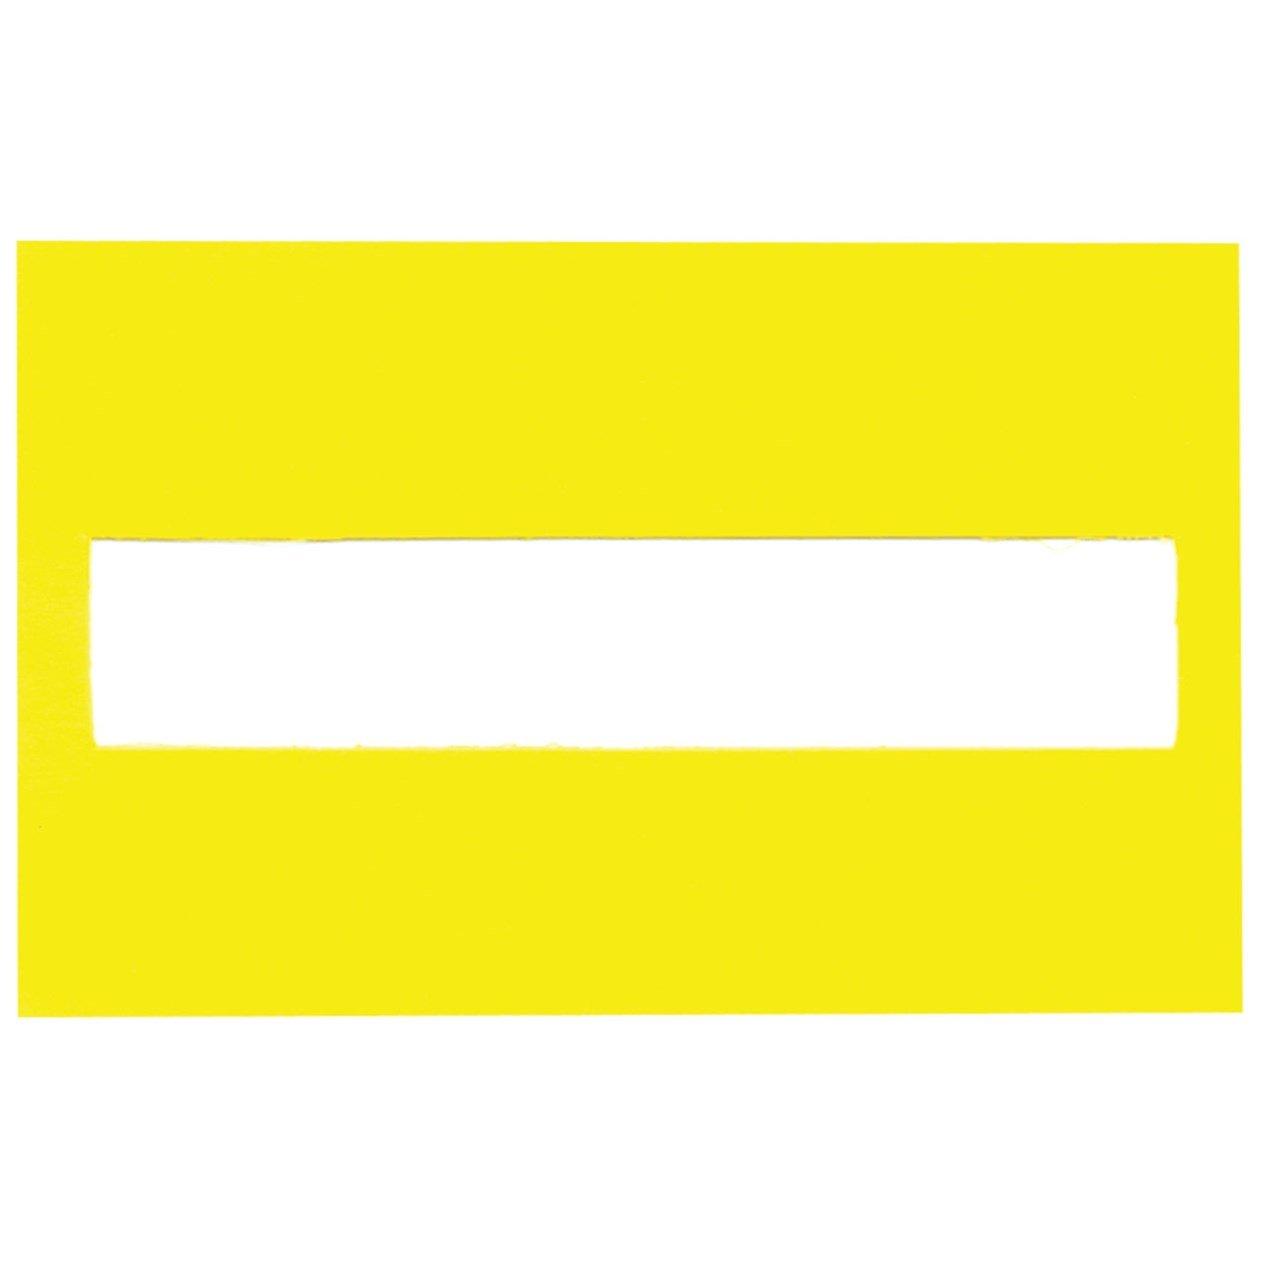 Signature Guide - Yellow Plastic